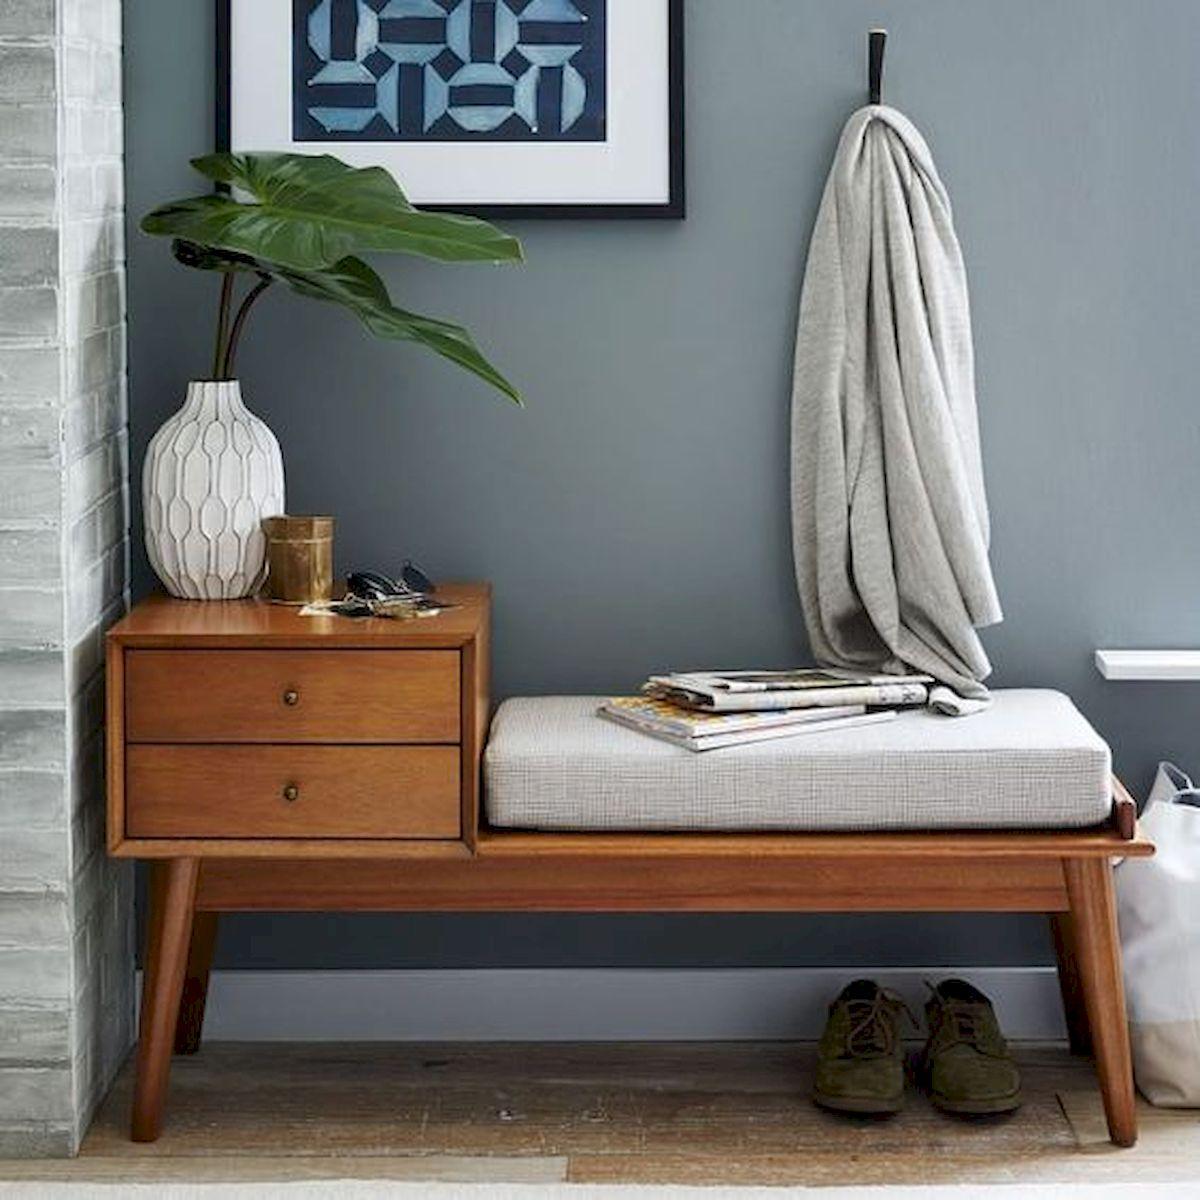 60 Creative DIY Home Decor Ideas for Apartments (1)